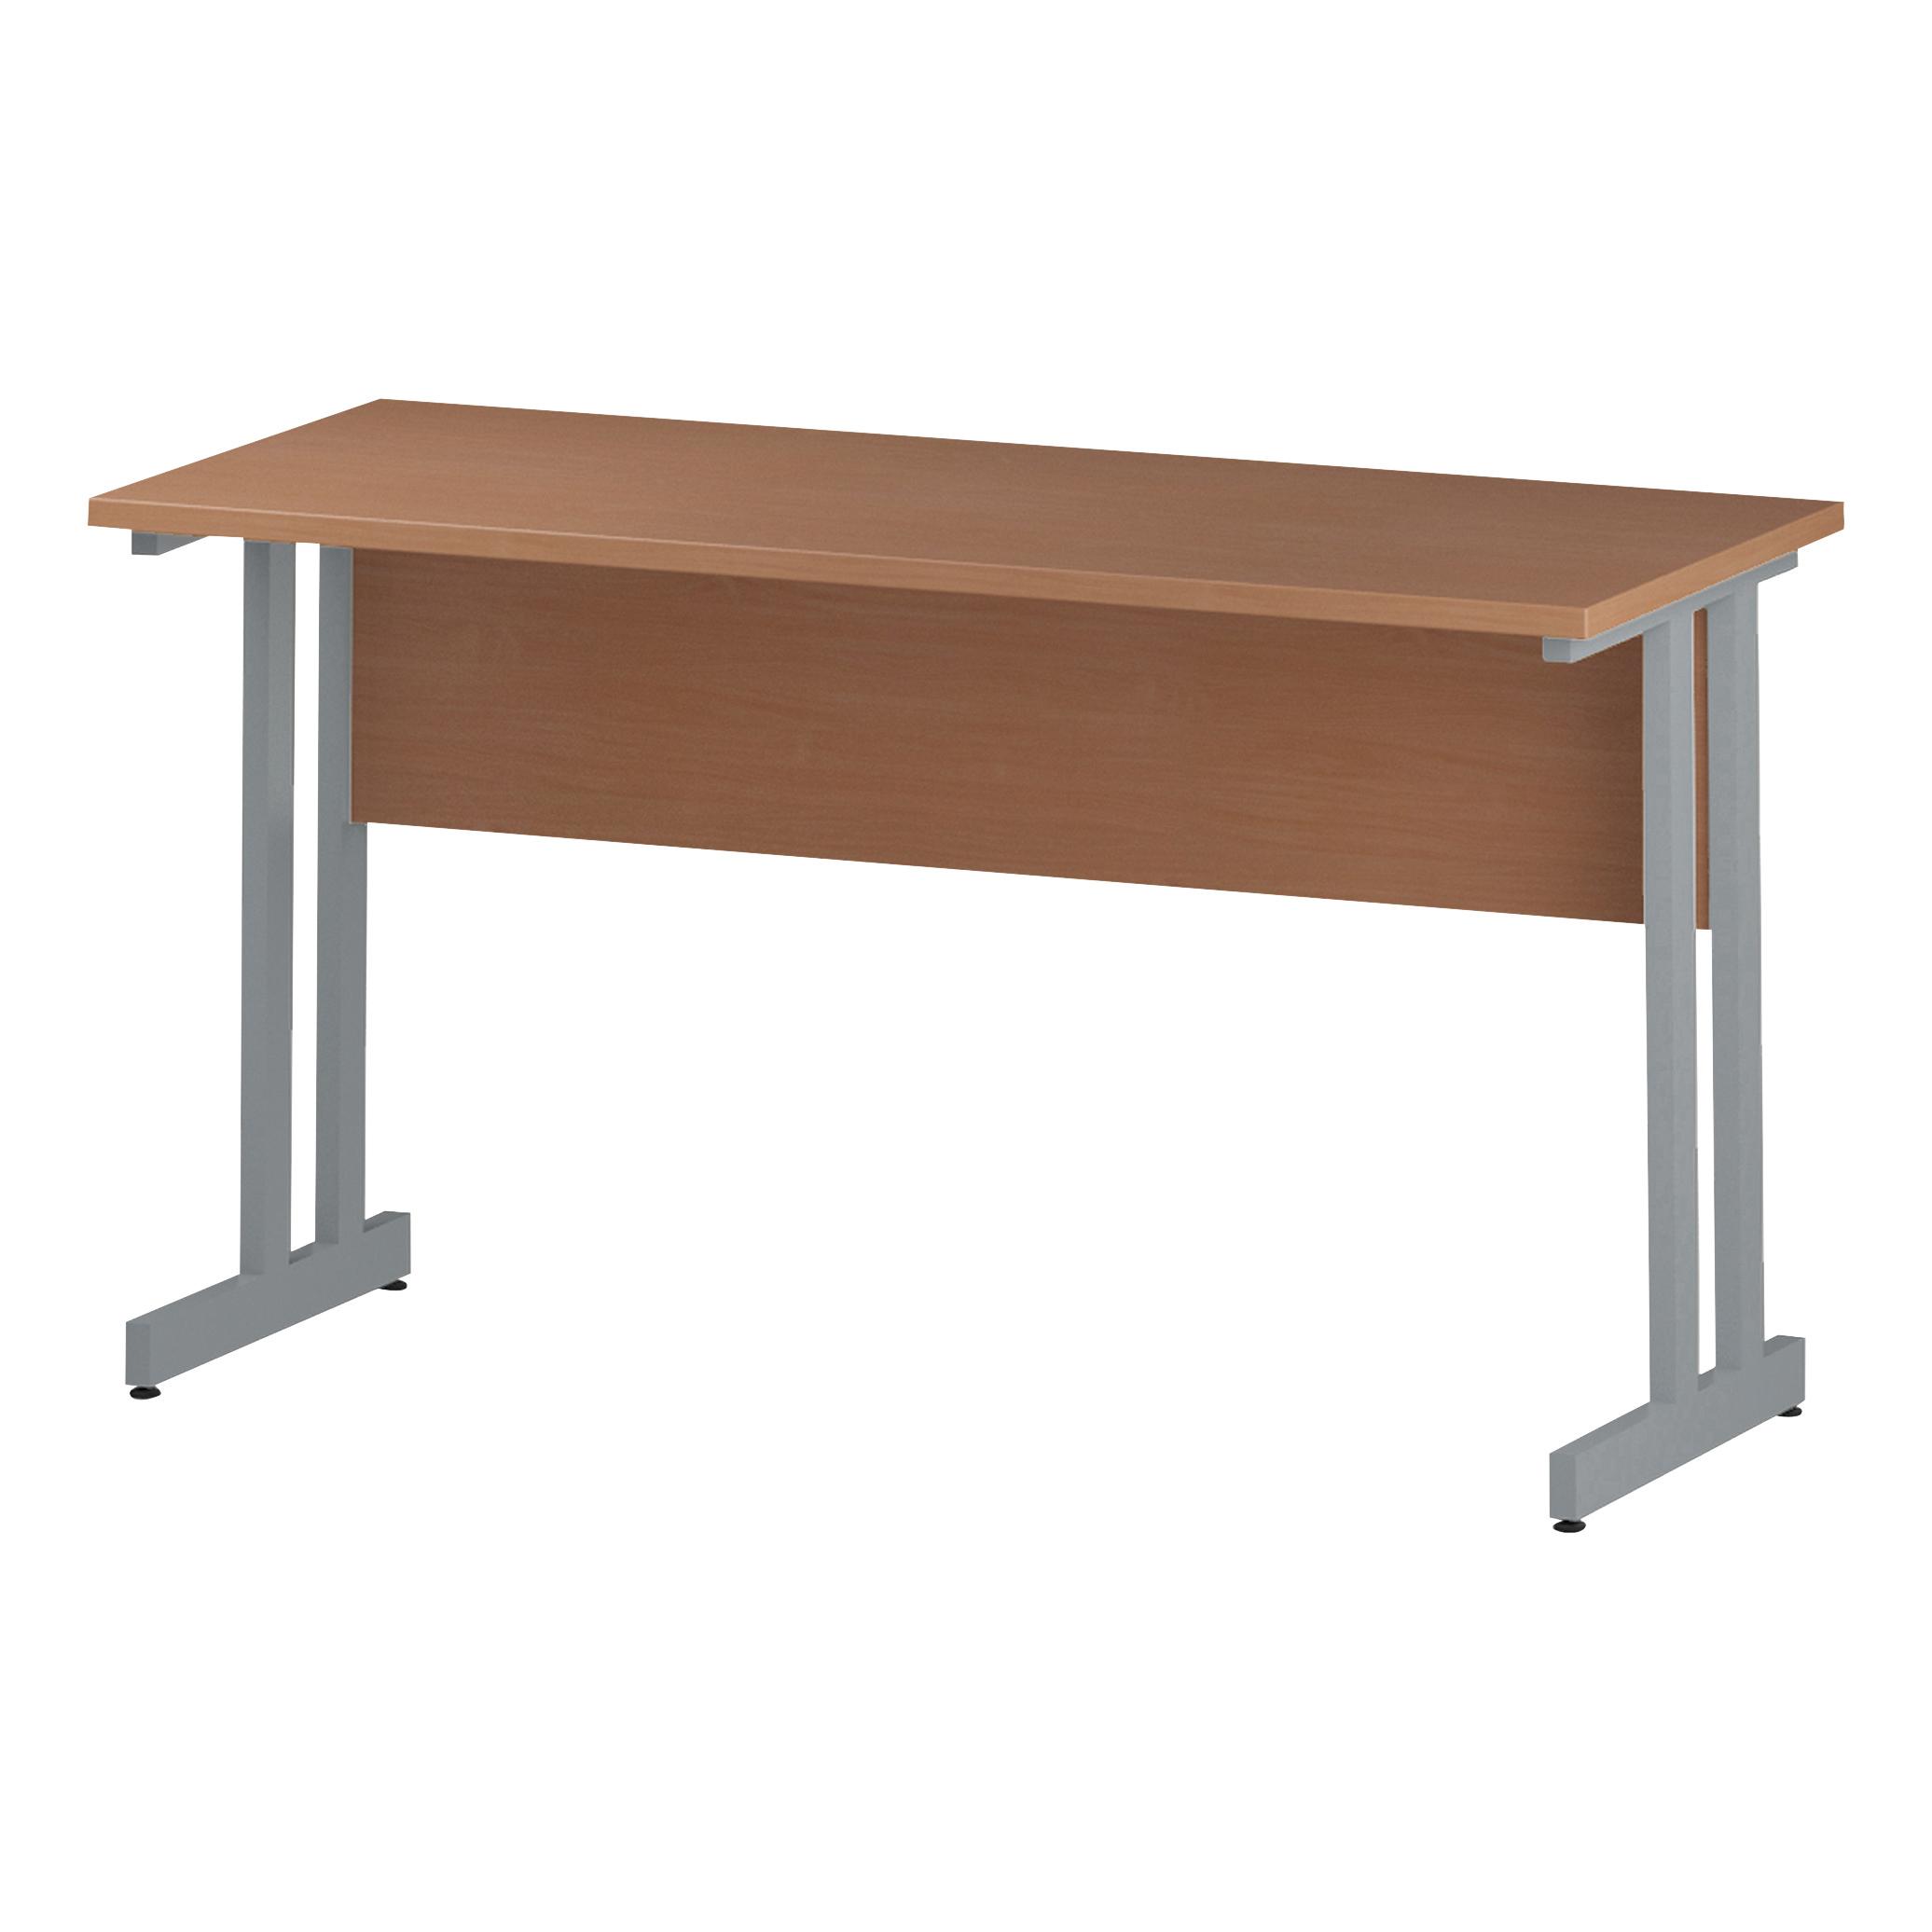 Trexus Rectangular Slim Desk Silver Cantilever Leg 1400x600mm Beech Ref I001680